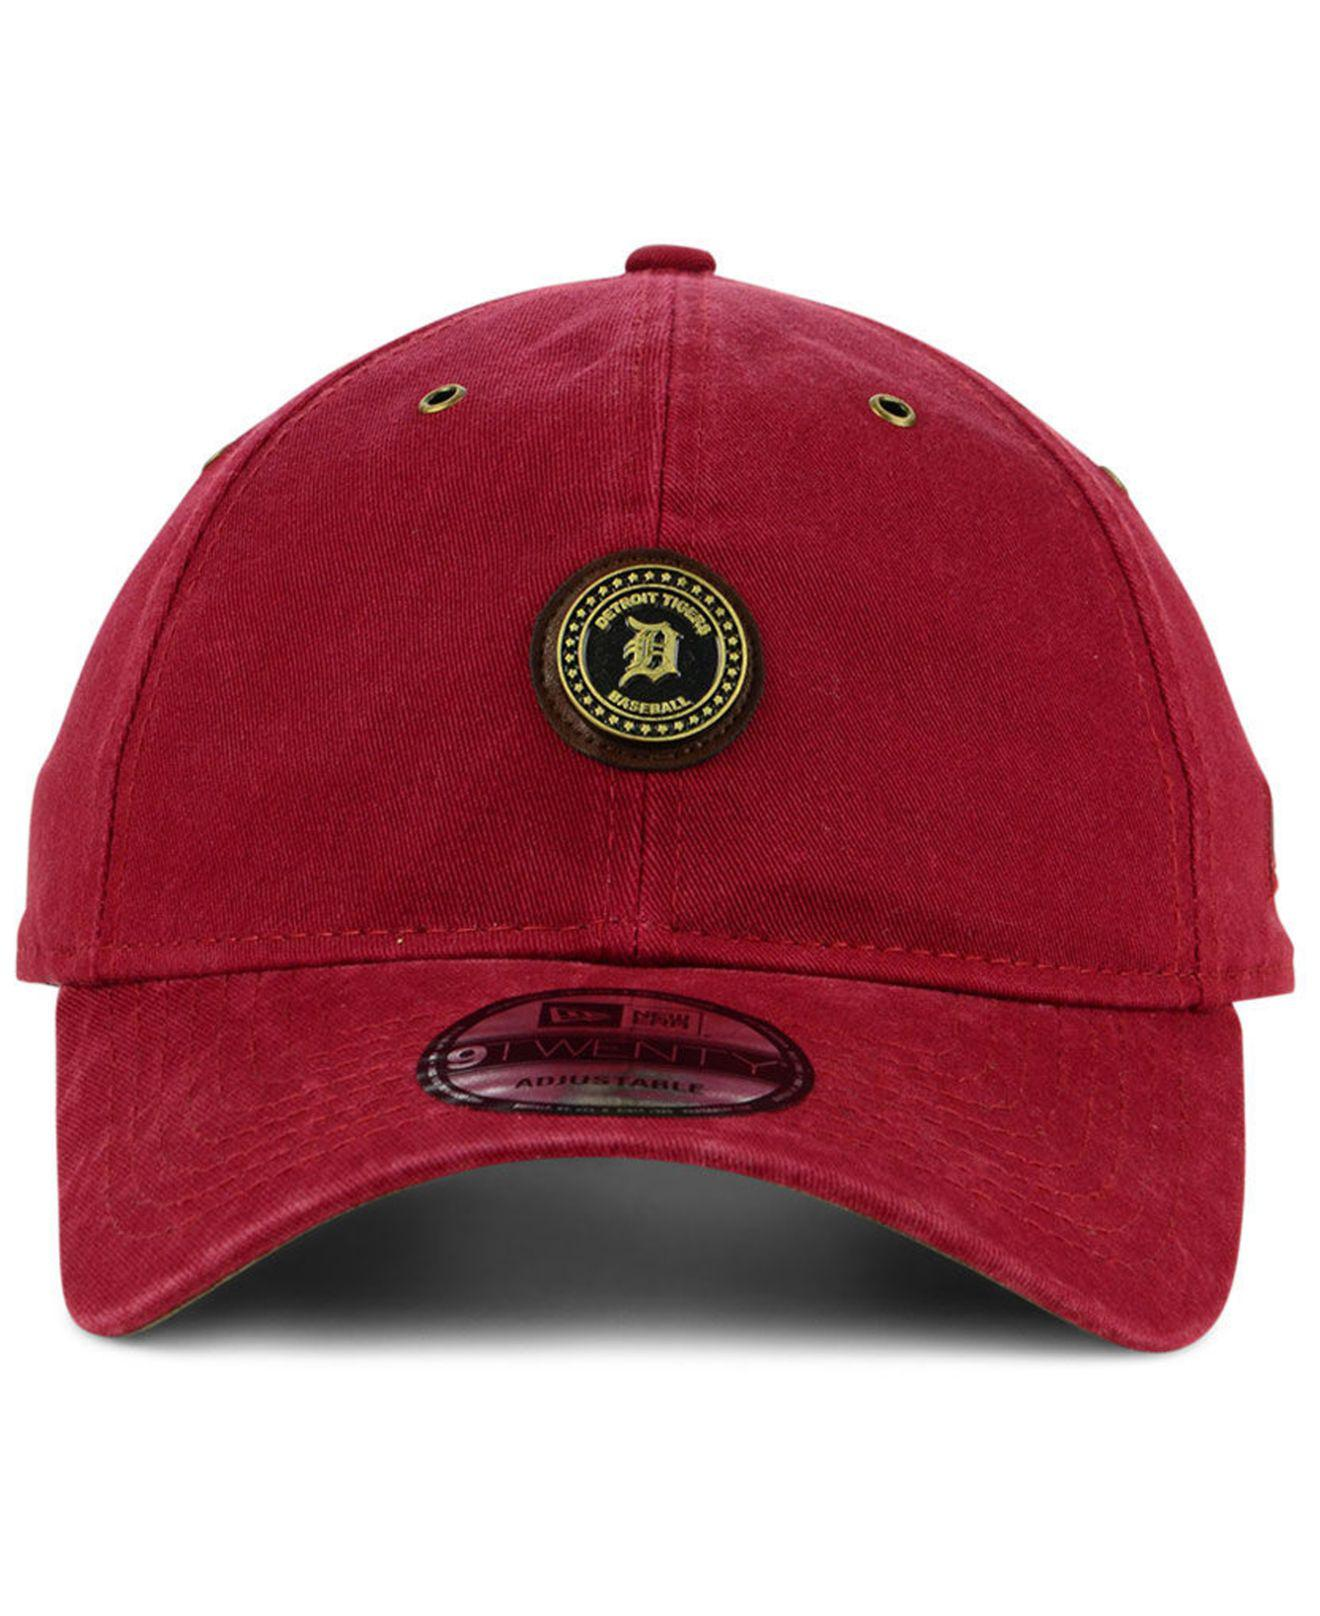 promo code f001c d2538 Lyst - KTZ Detroit Tigers Coin 9twenty Cap in Red for Men